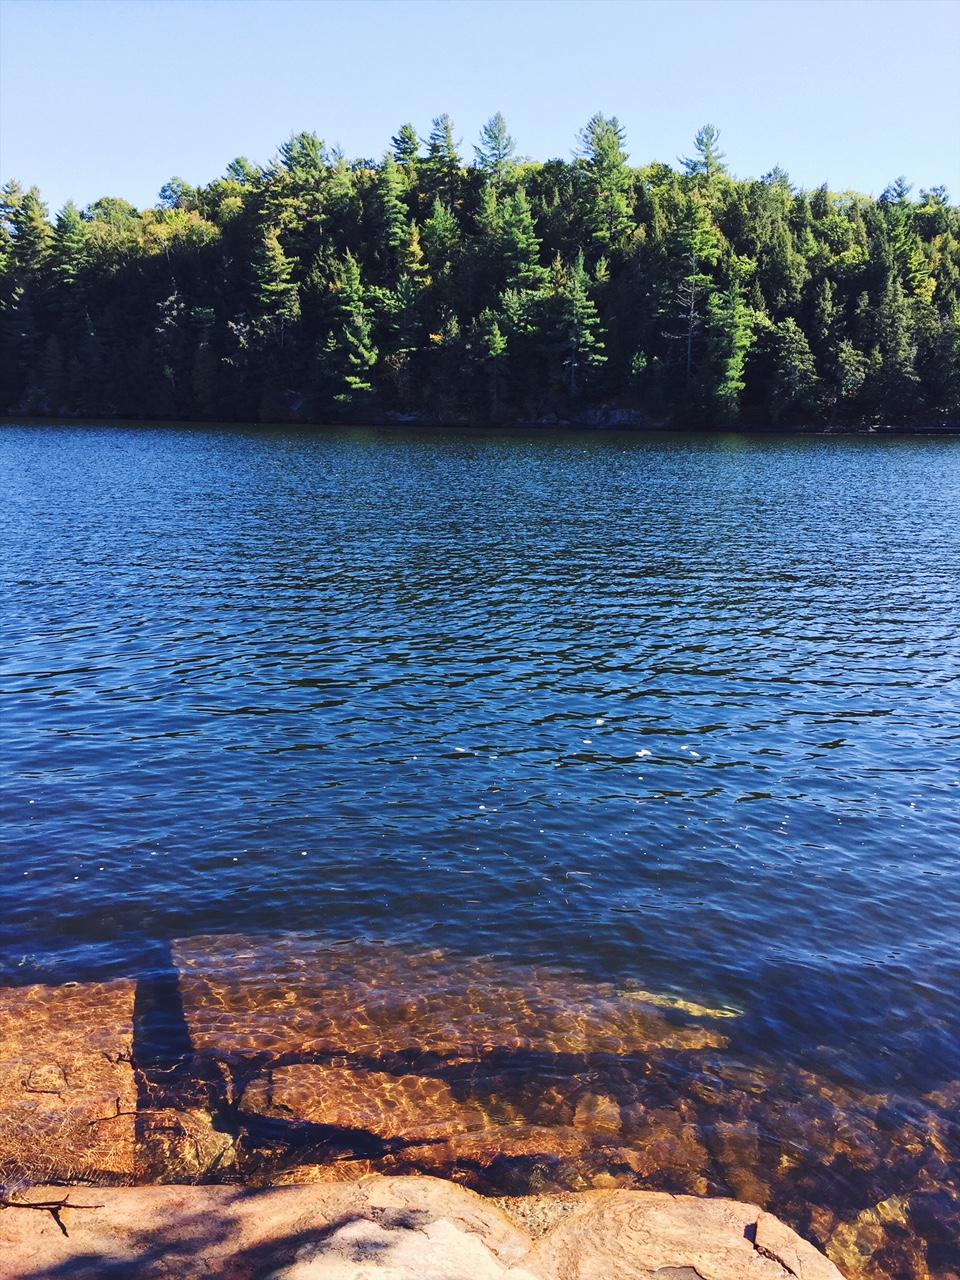 Nudie swims at Lake Kawagama, in the Muskoka region of Northern Ontario, Canada.